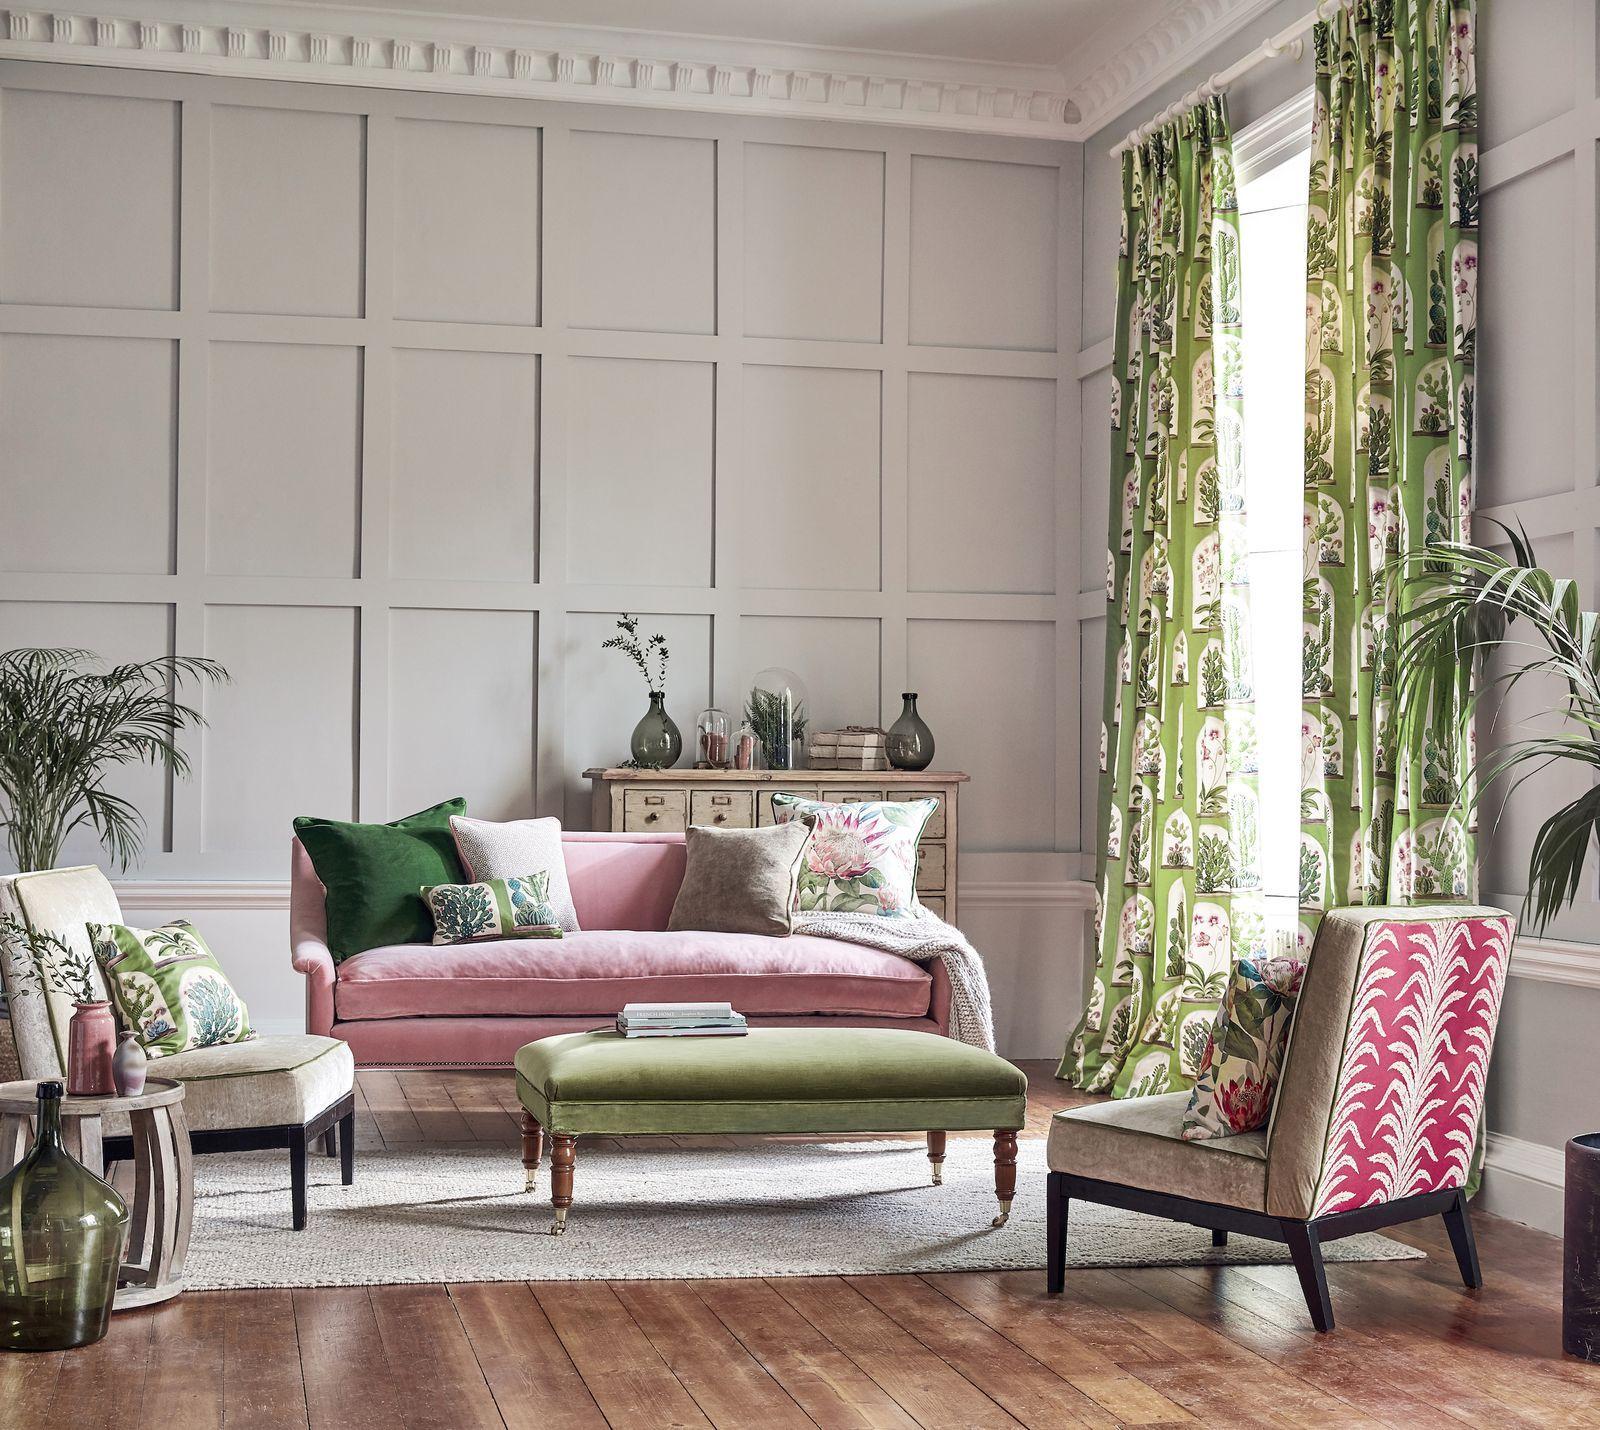 19 Grey Living Room Ideas In 2020 Living Room Grey Gray Living Room Design Living Room Ideas Uk